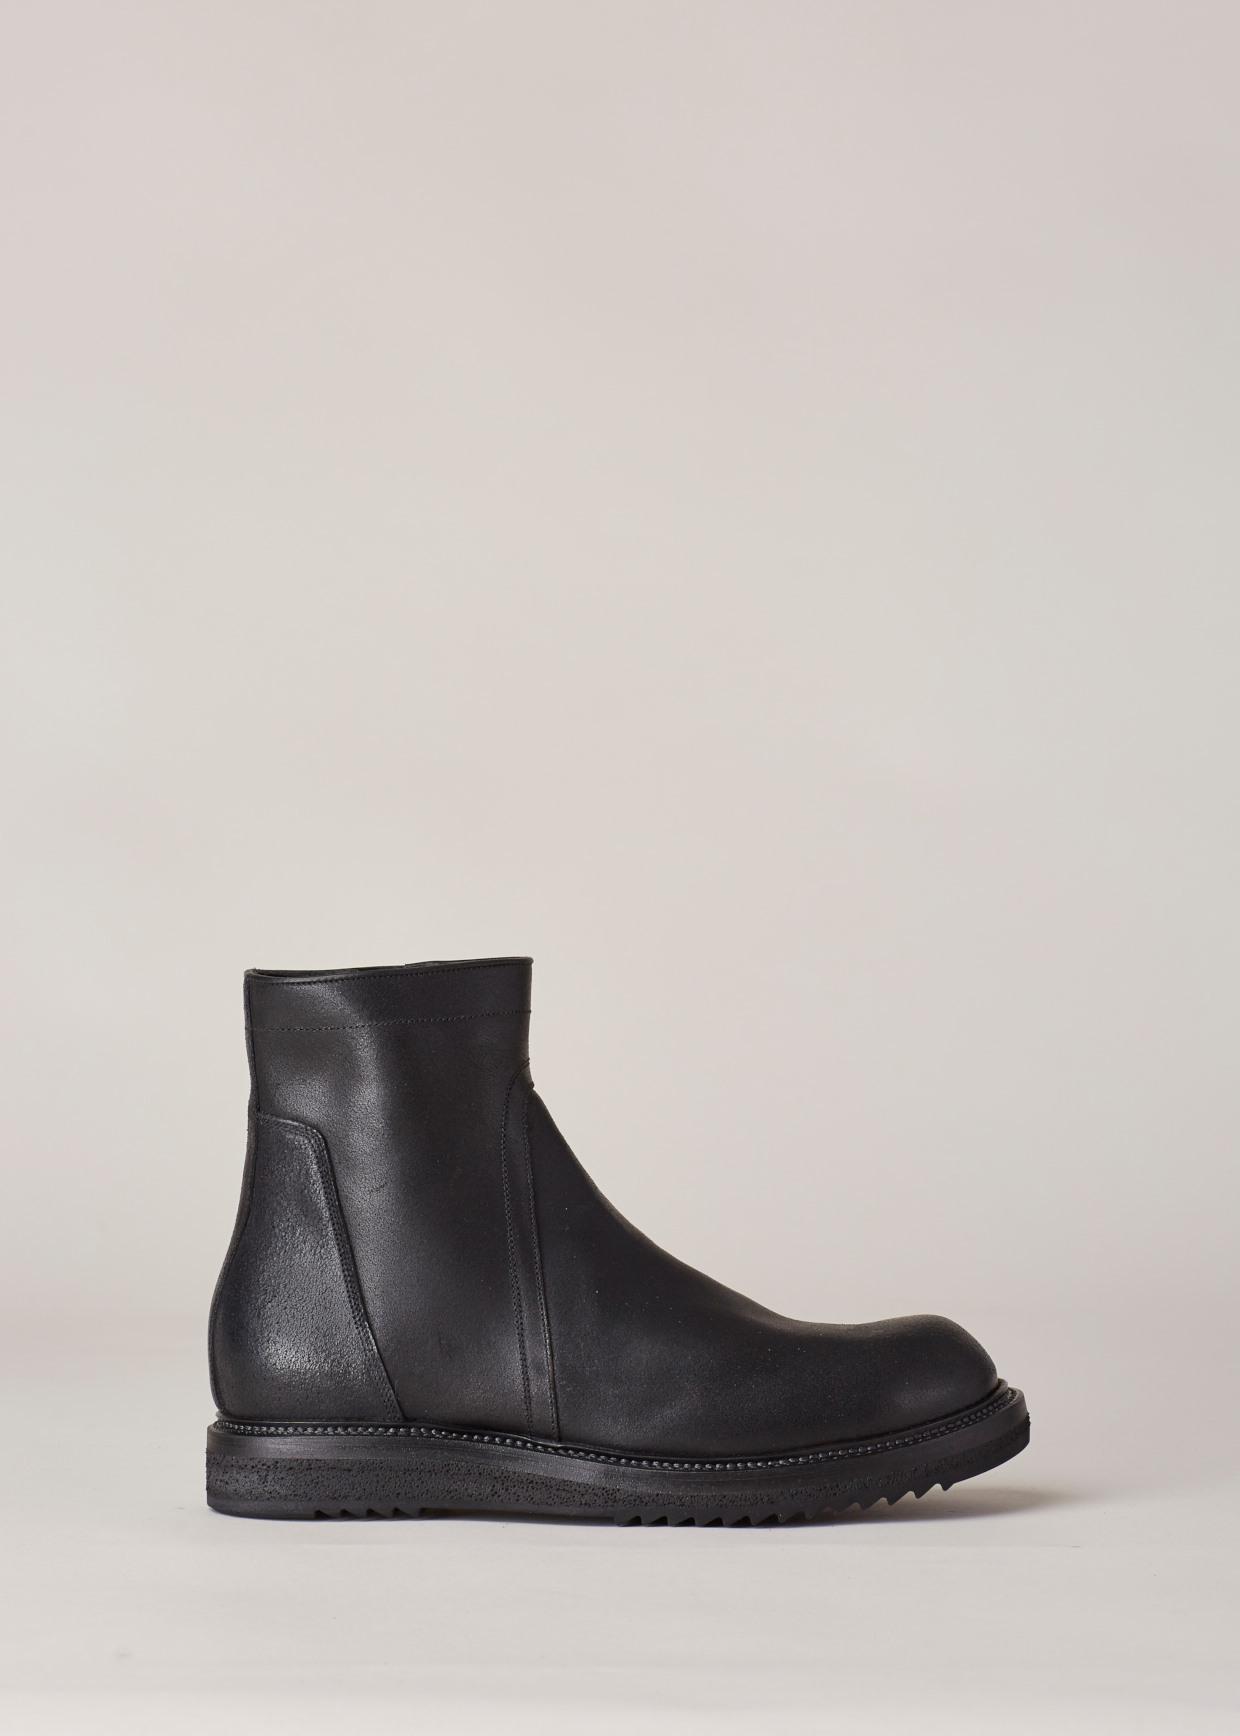 Rick Owens Black Creeper Chelsea Boots kqDuTpxS